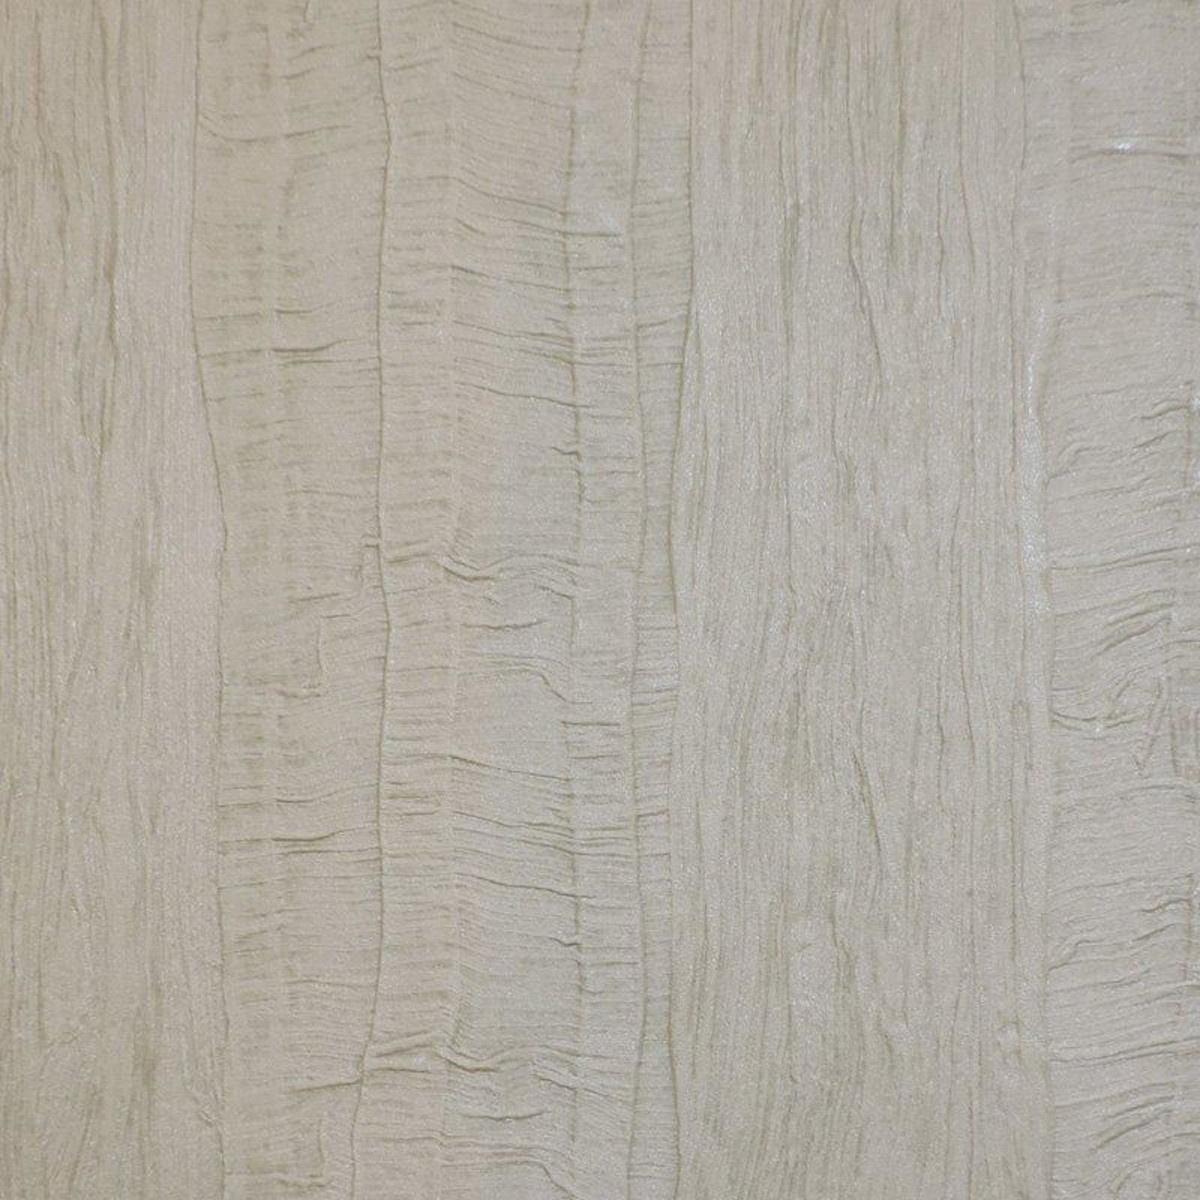 Обои виниловые Zambaiti Interior серые 0.53 м 7425